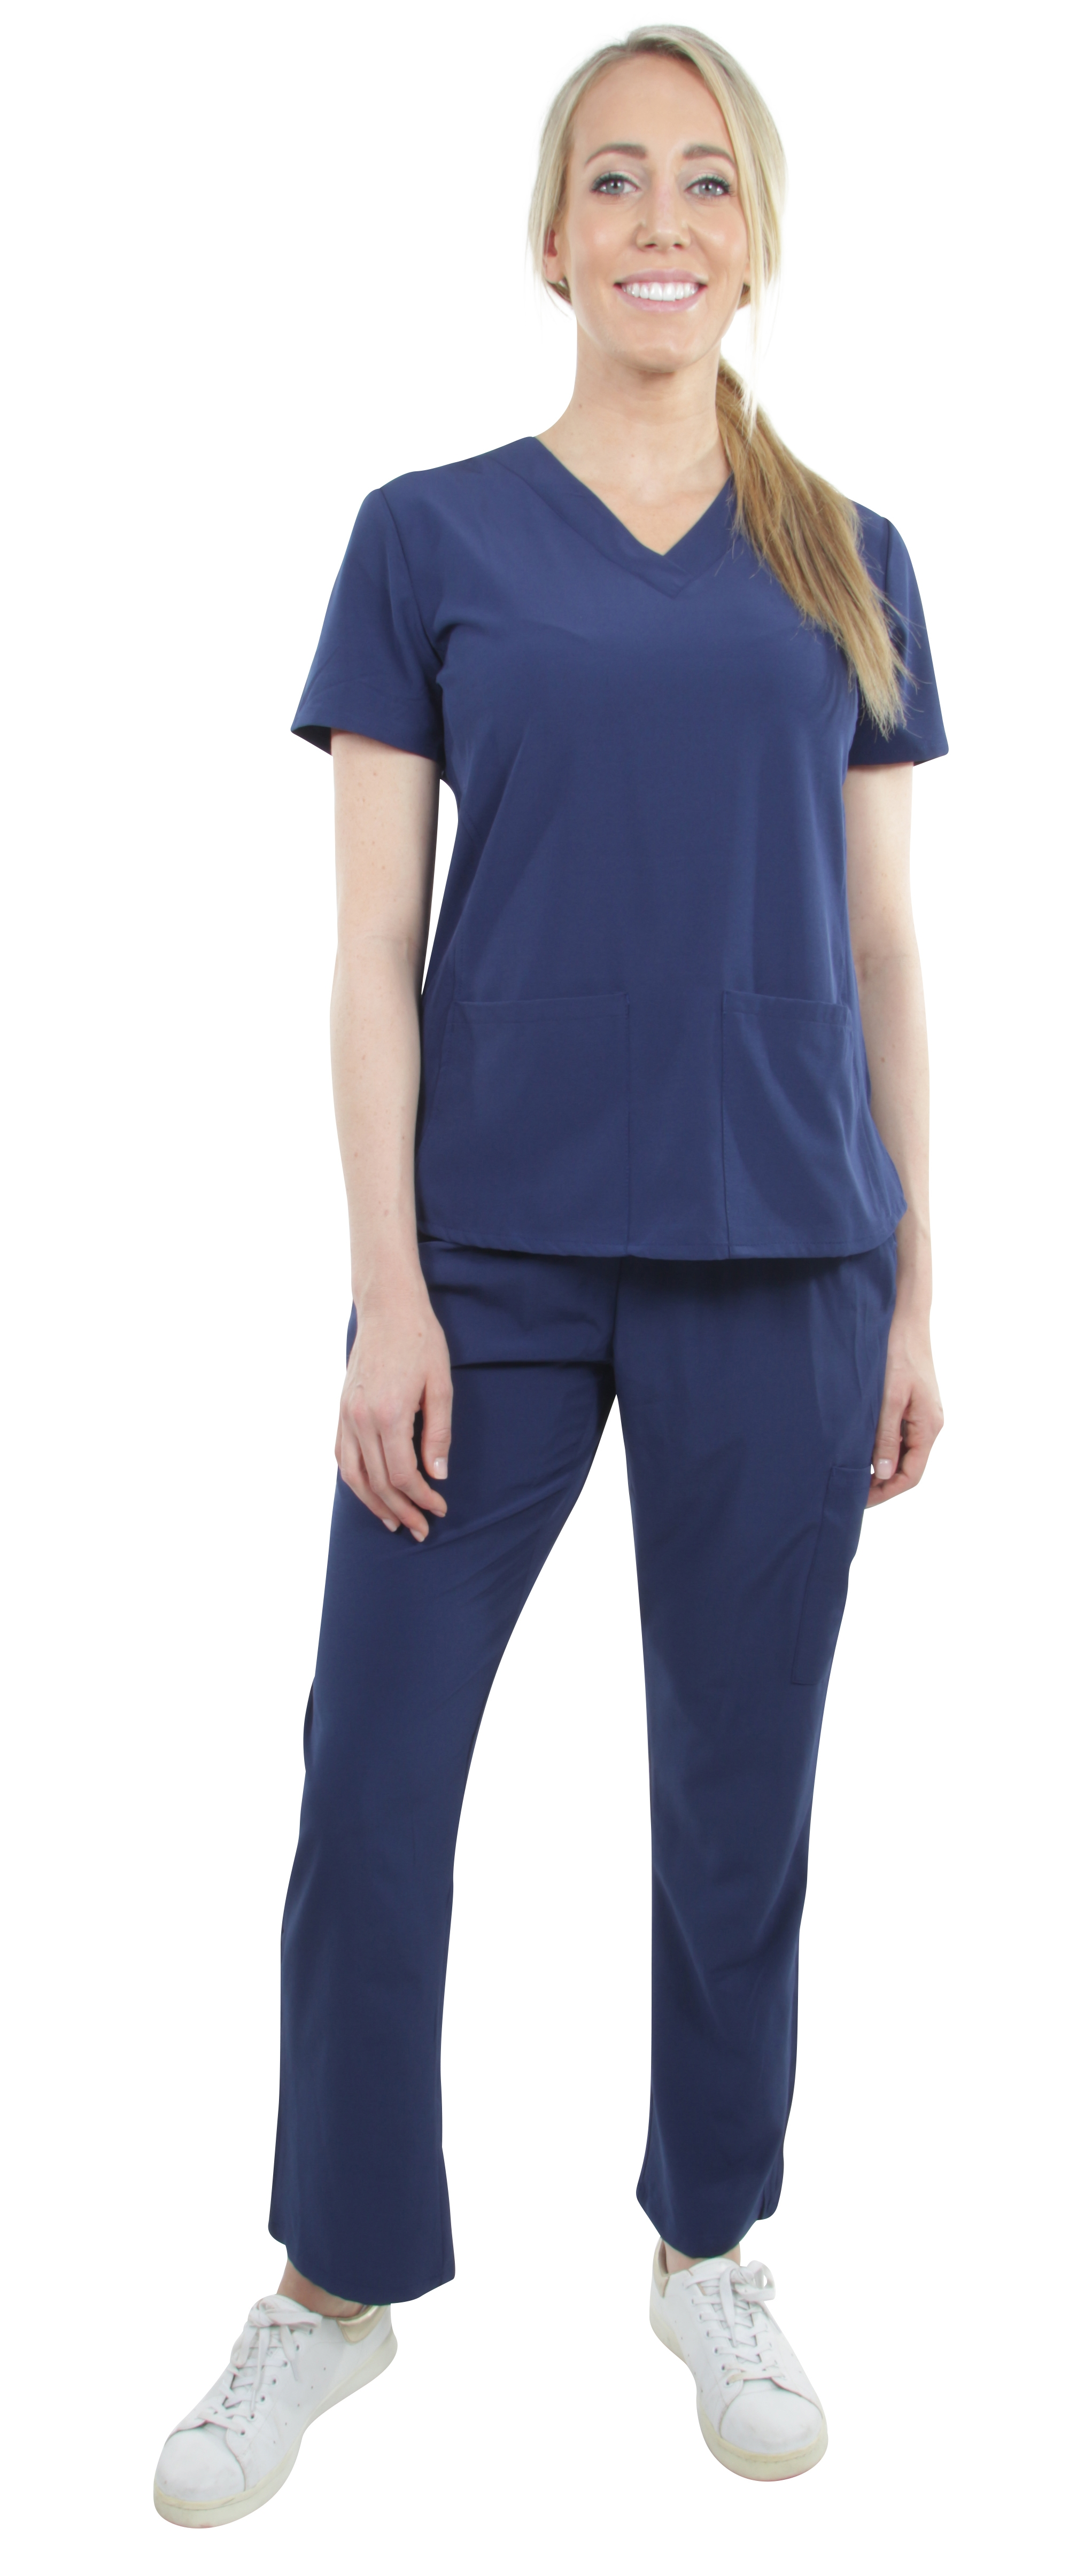 Unisex-Stretch-Medical-Uniform-Five-Pockets-V-Neck-Scrubs-Sets-with-Side-Panels thumbnail 33